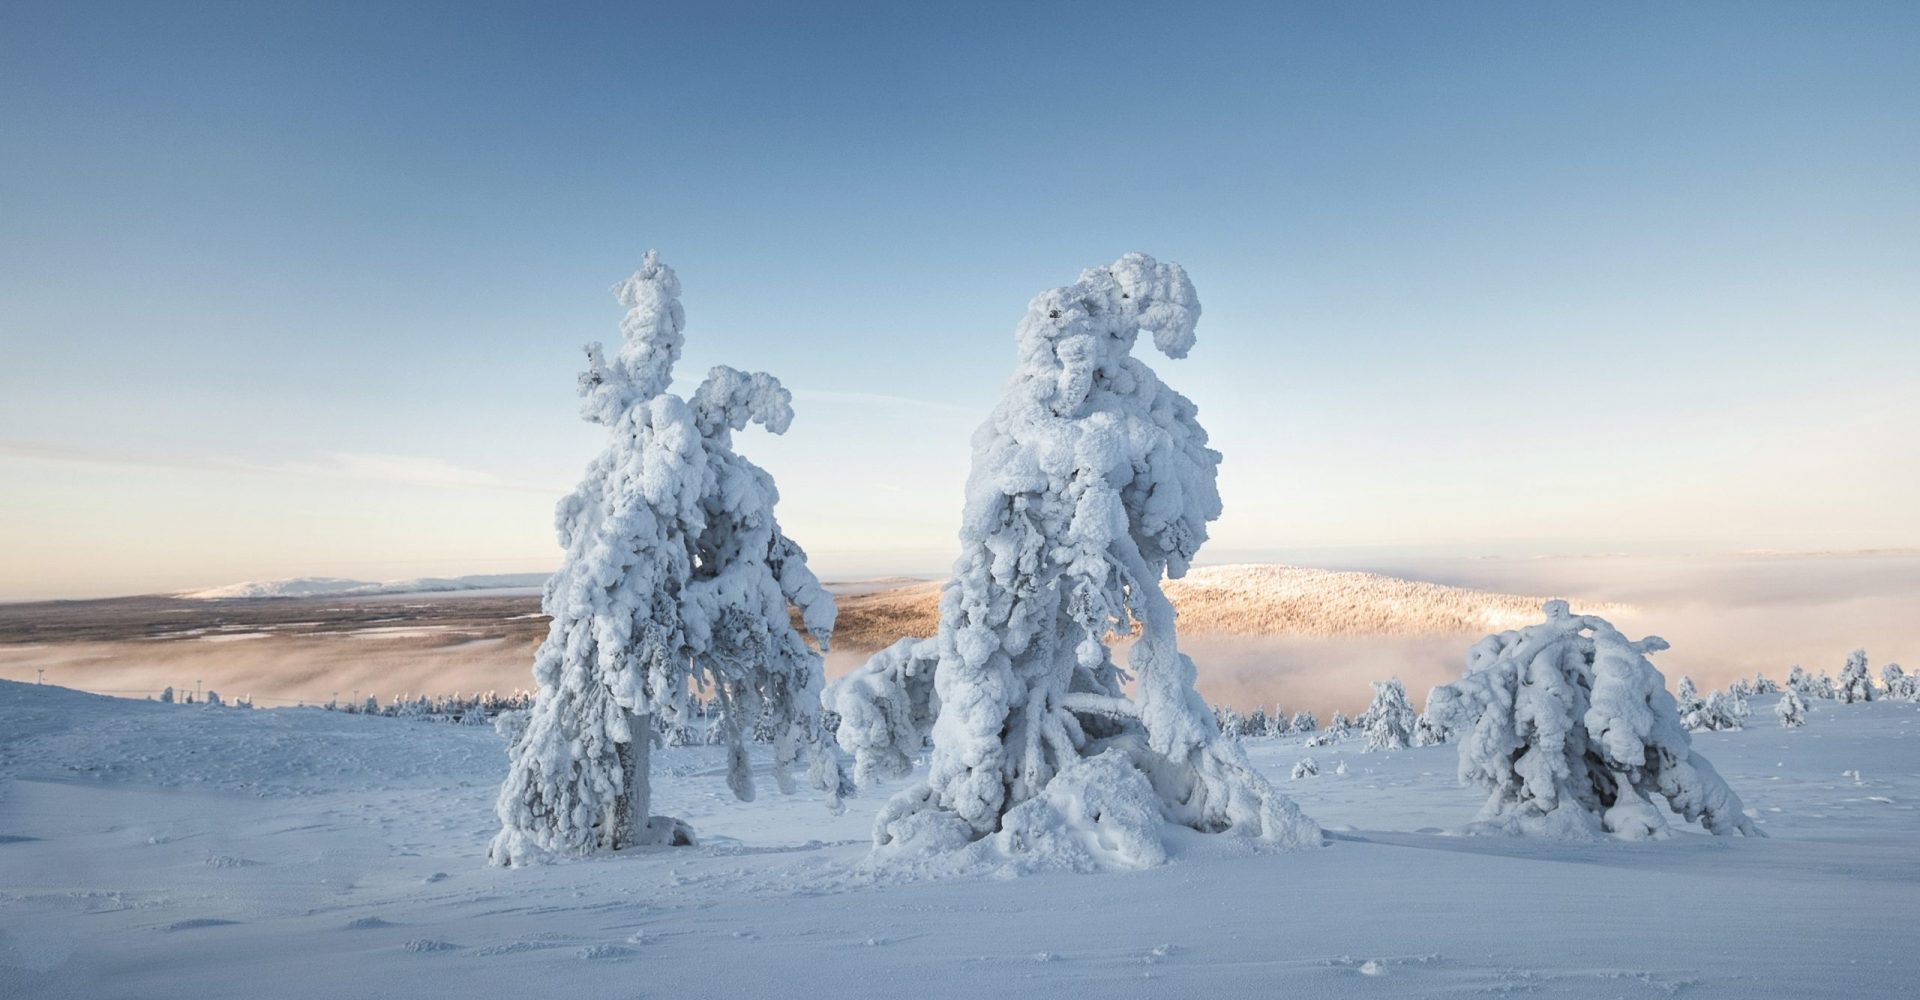 Levi Fell in Finland